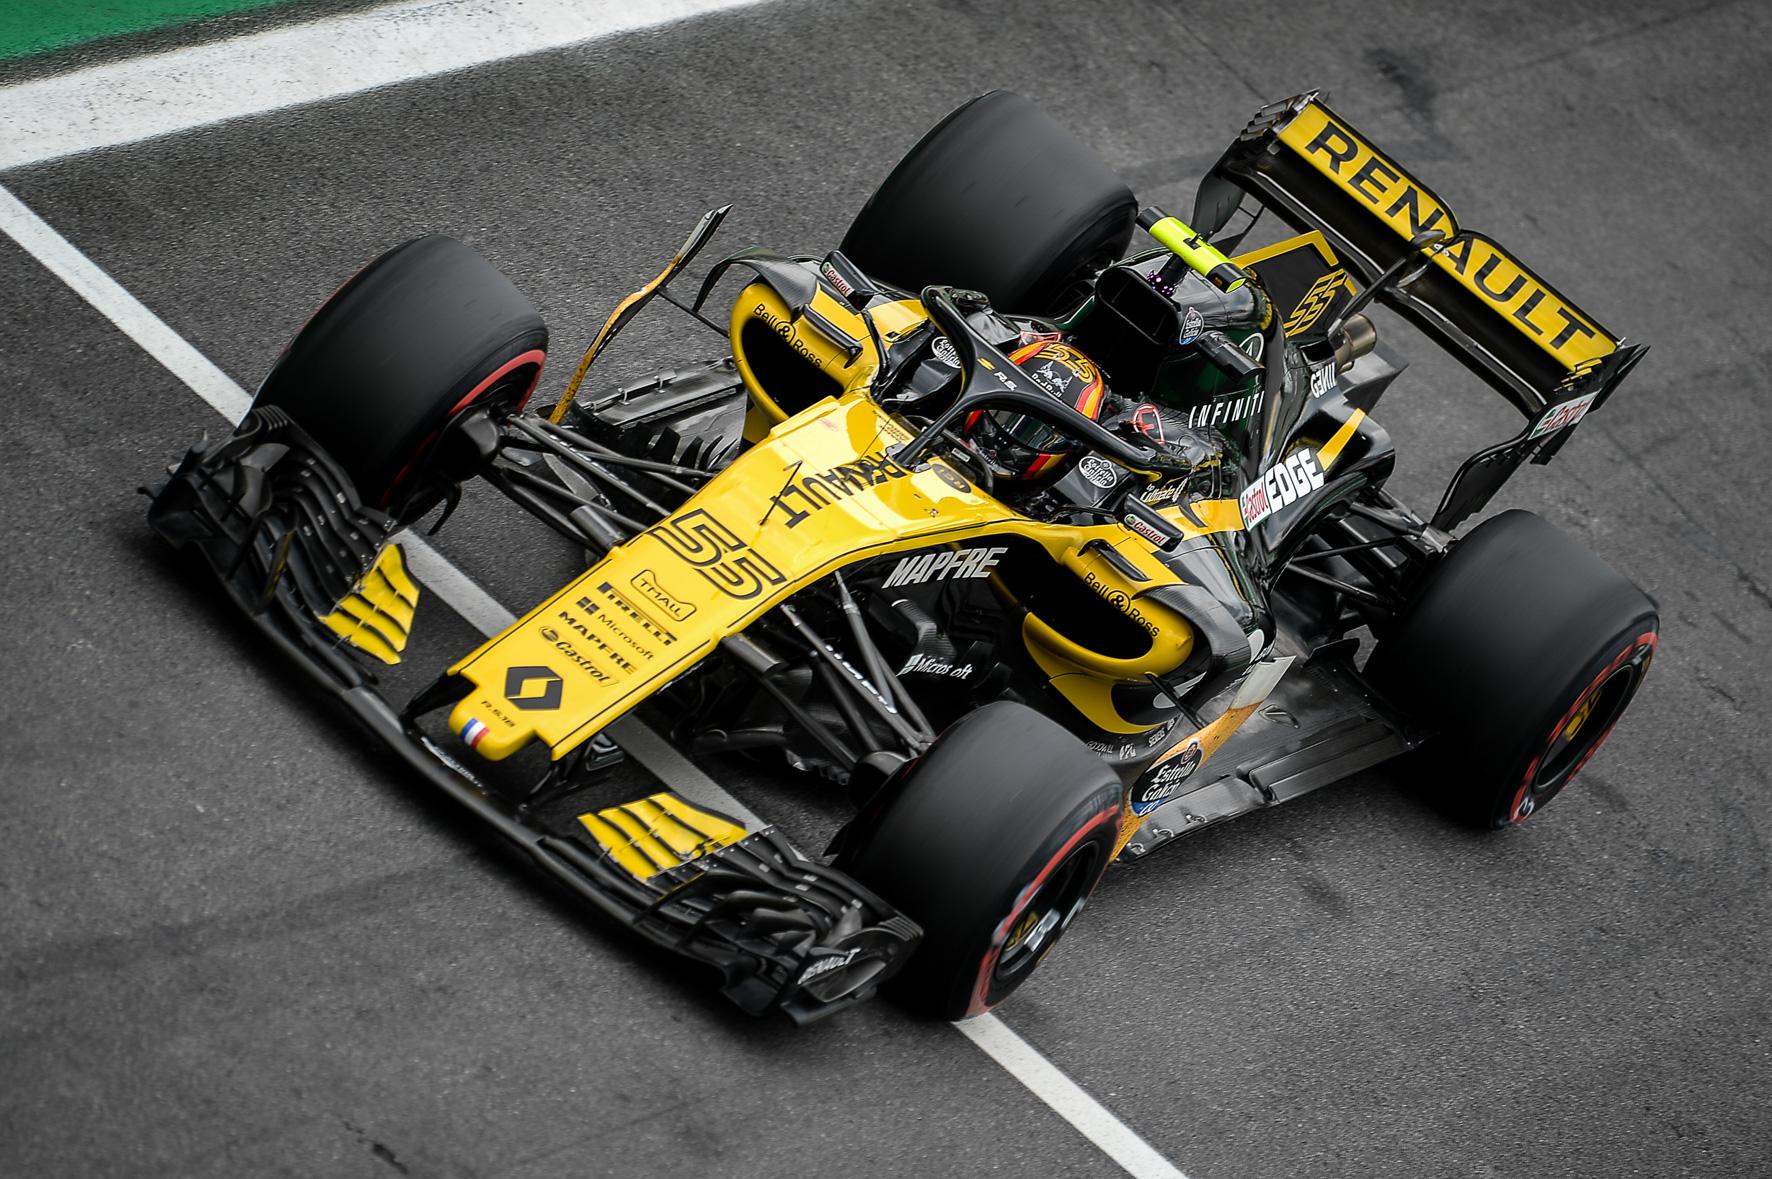 GPBrasil2018_dudabairros_Renault-32179